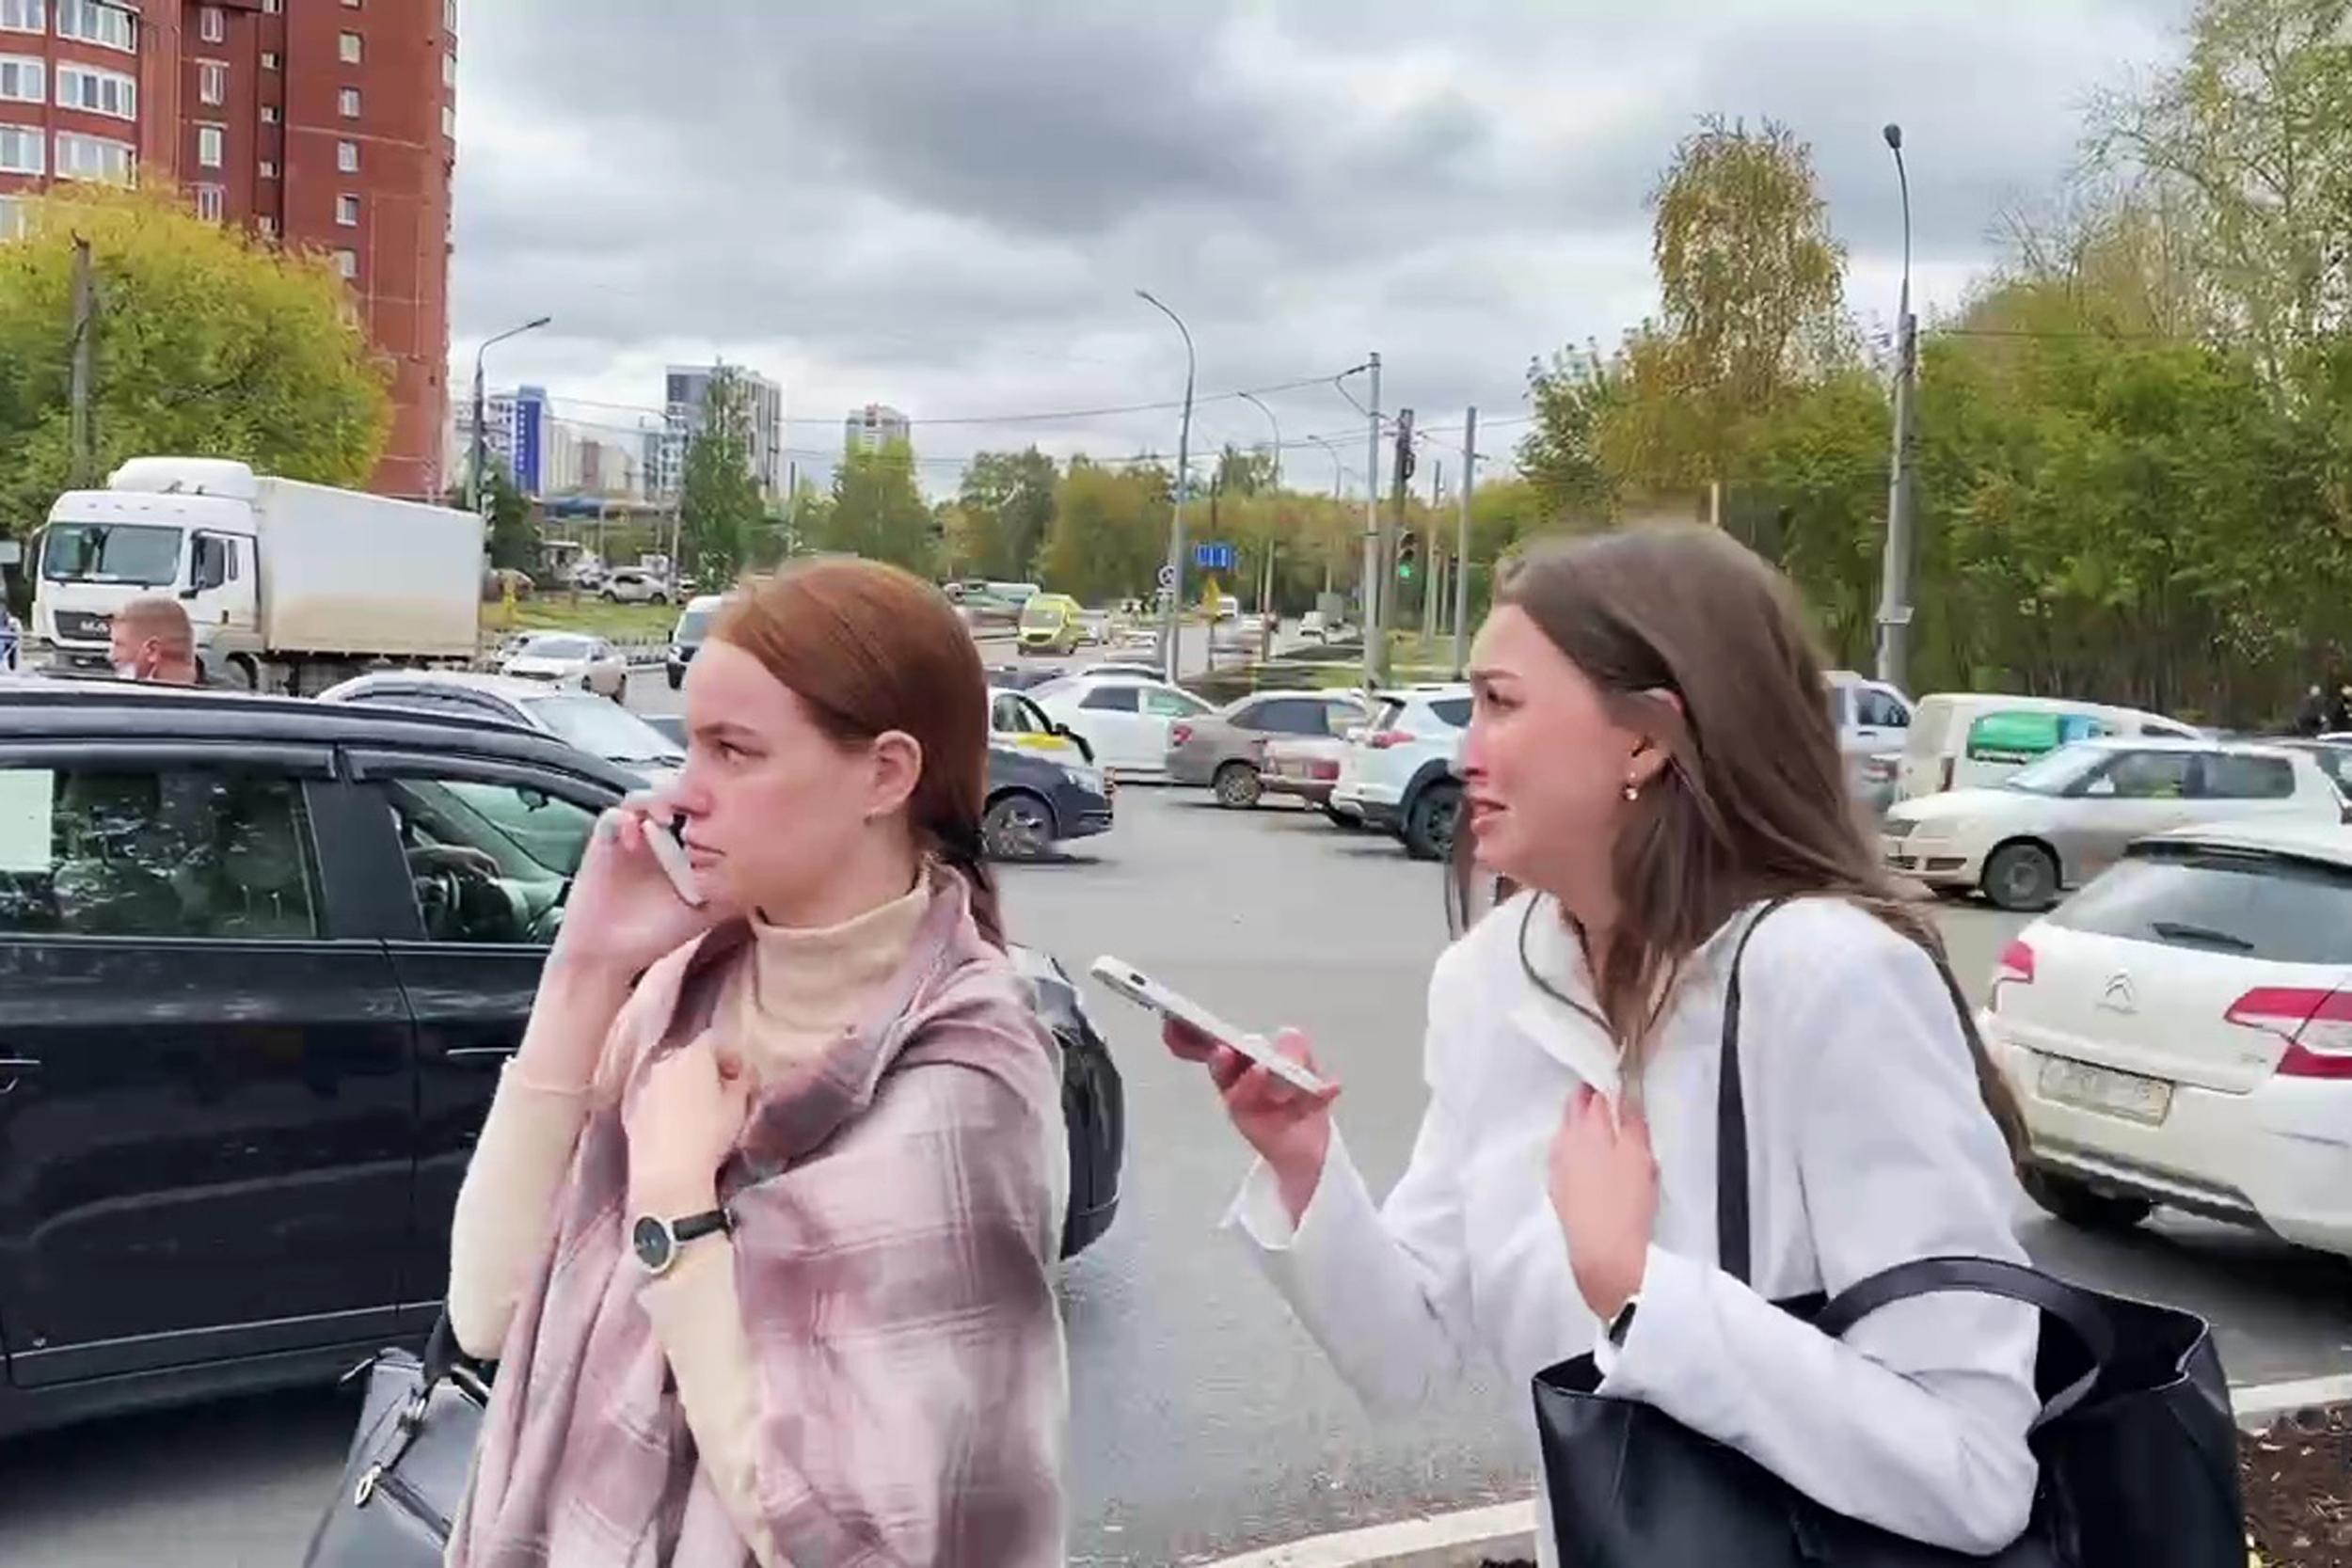 Gunman kills 8, injures 11 at Russian university